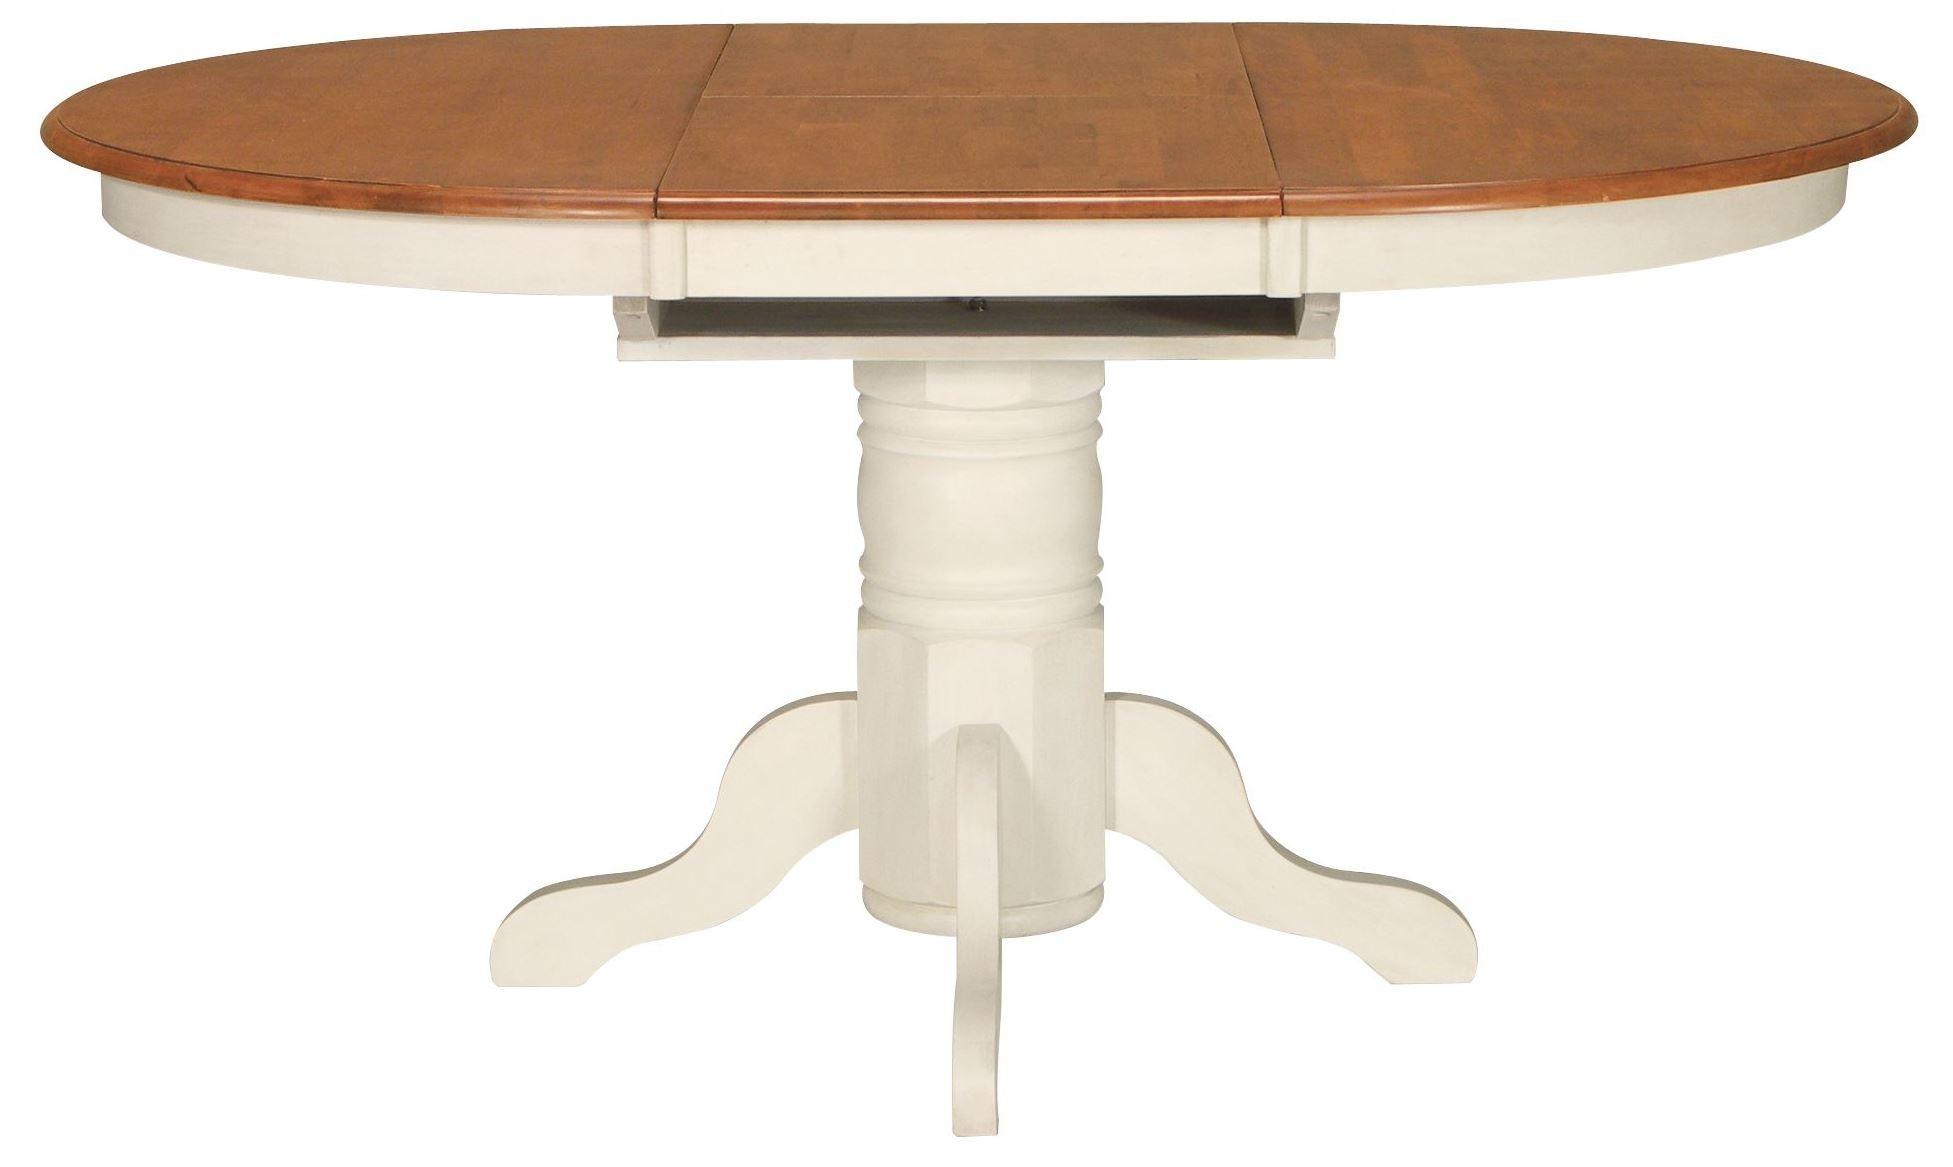 Madison park heritage oak pearl oval butterfly extendable pedestal dining table t60 48xb 42xbt - Oak extendable dining table ...